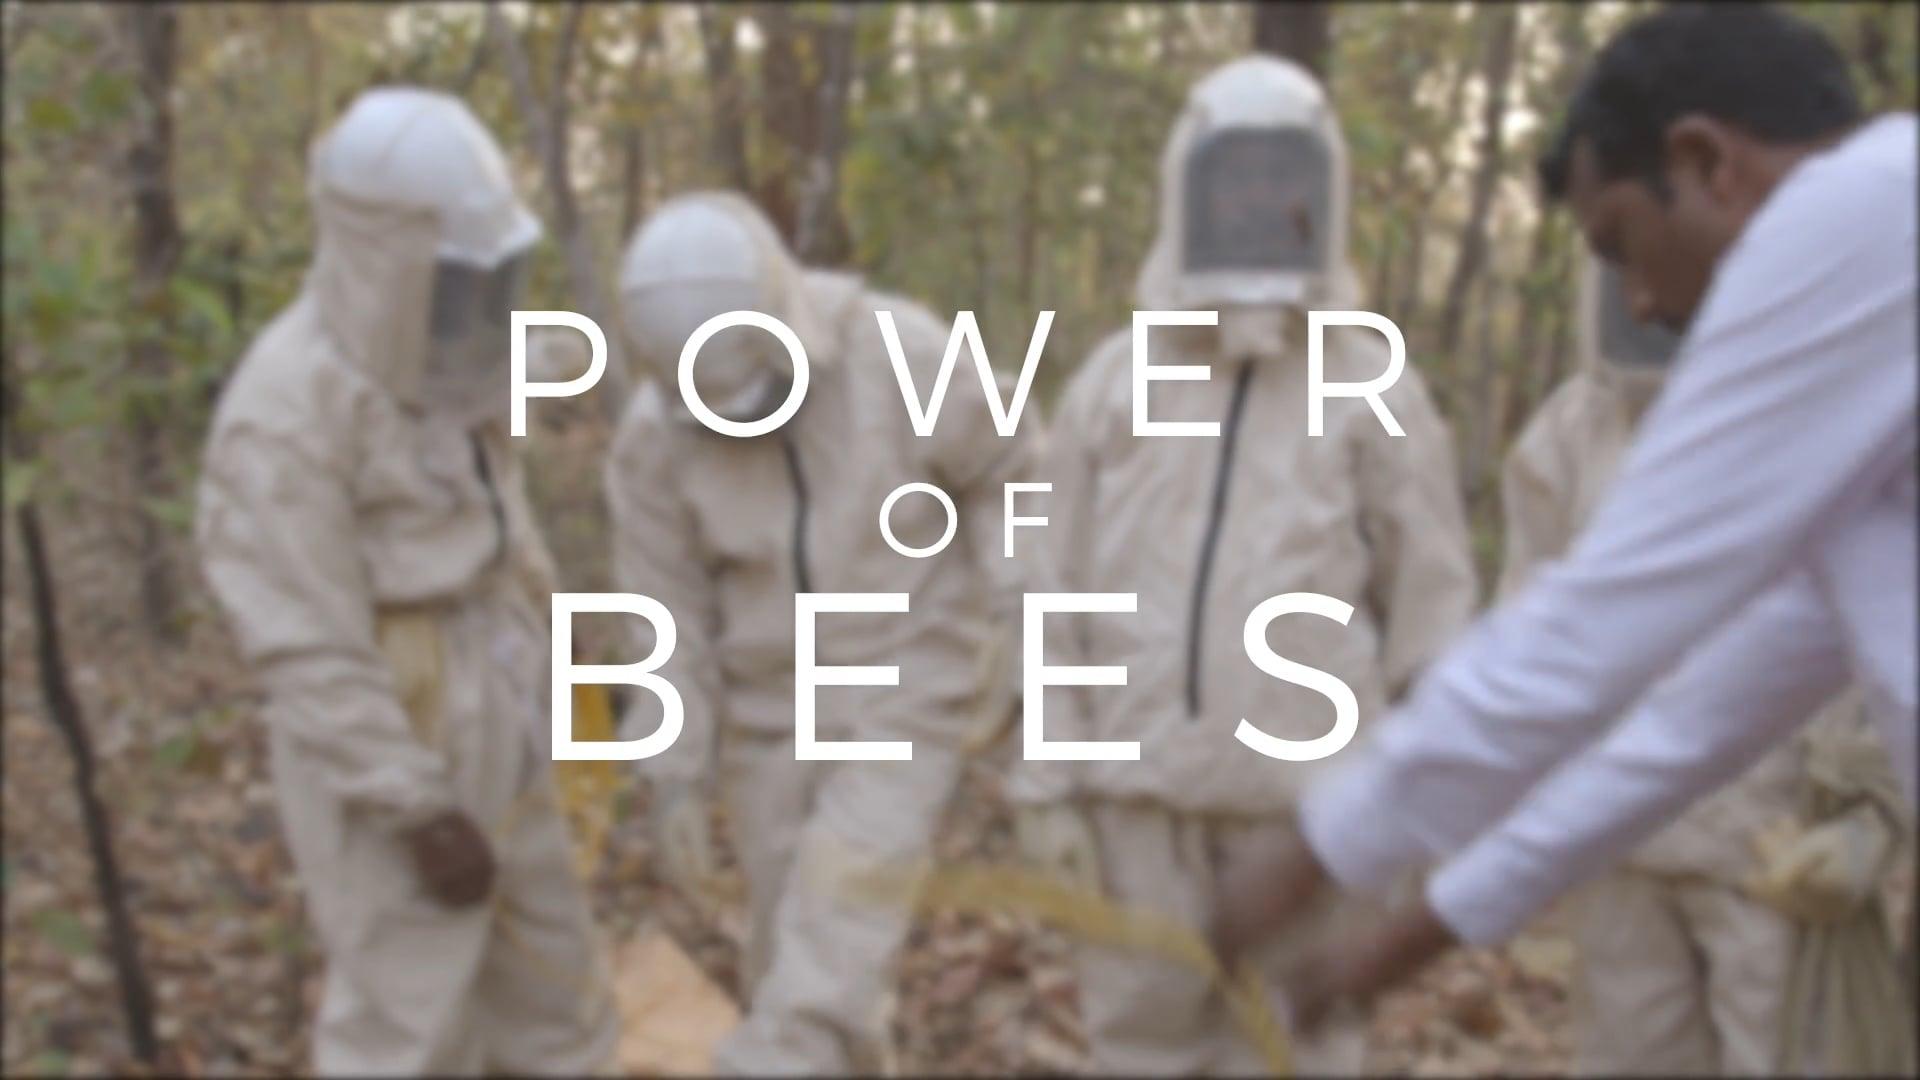 Heavenly Organics - Power of Bees